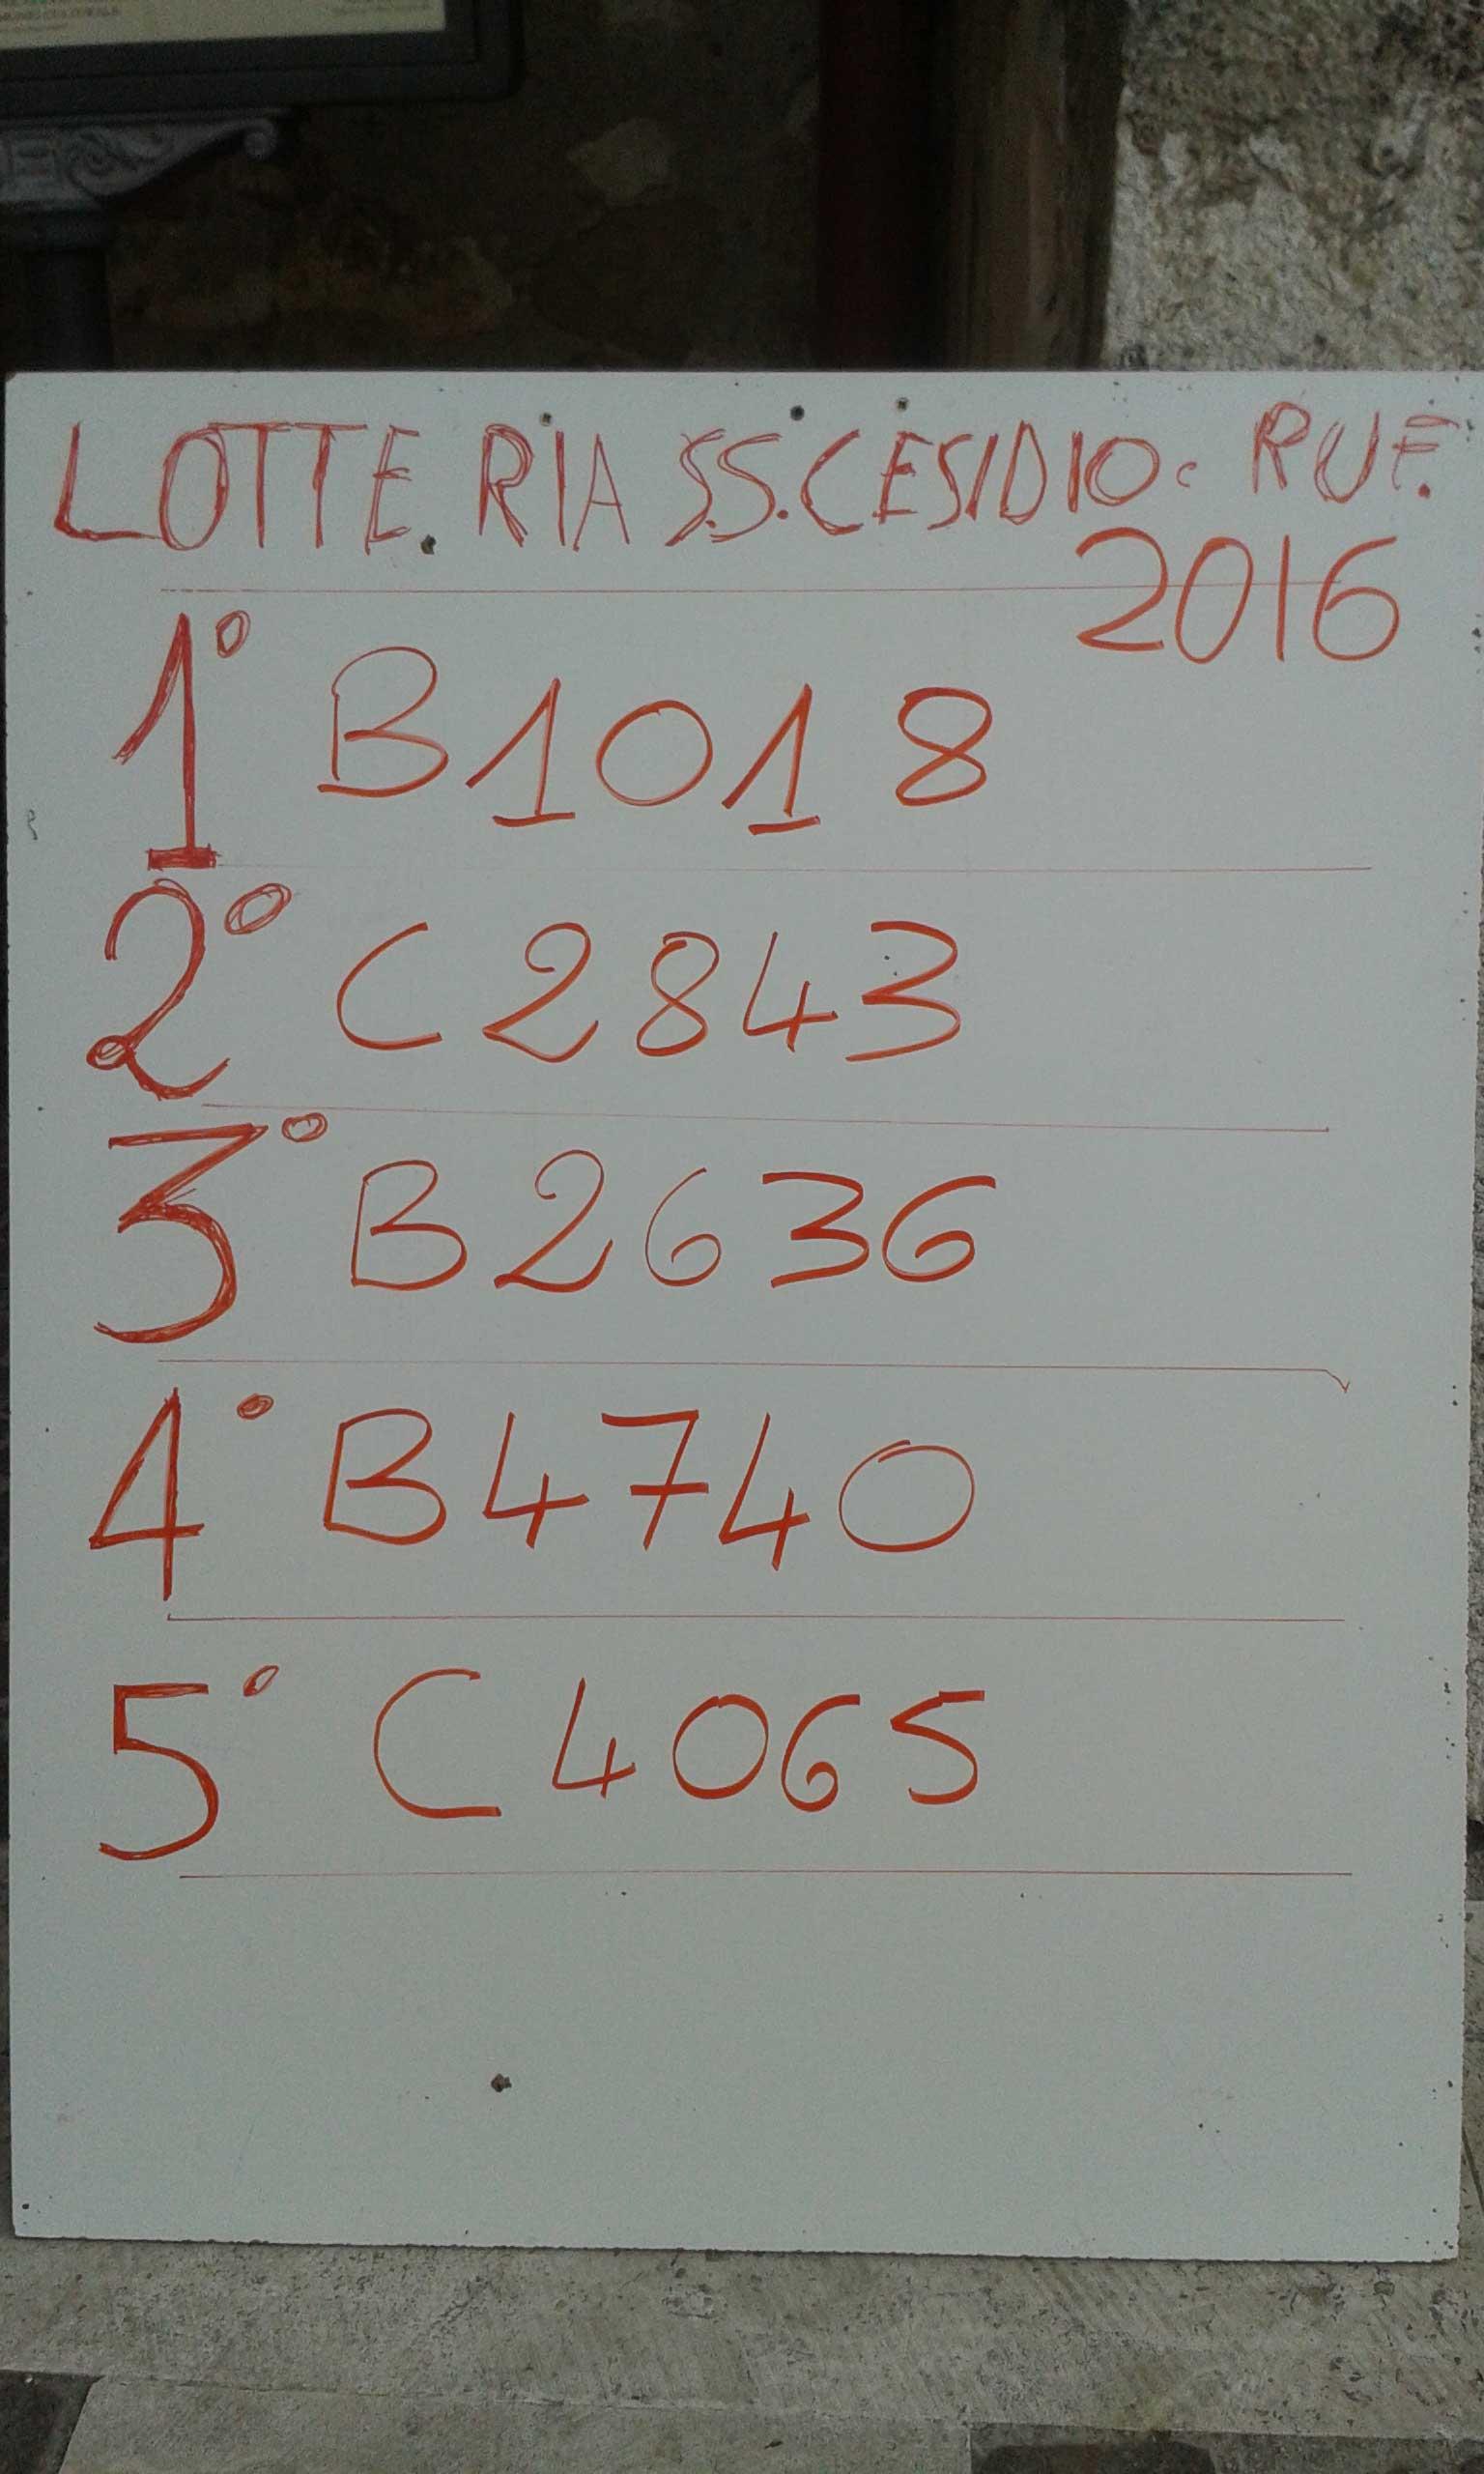 lotteria san cesidio, 2016, Trasacco